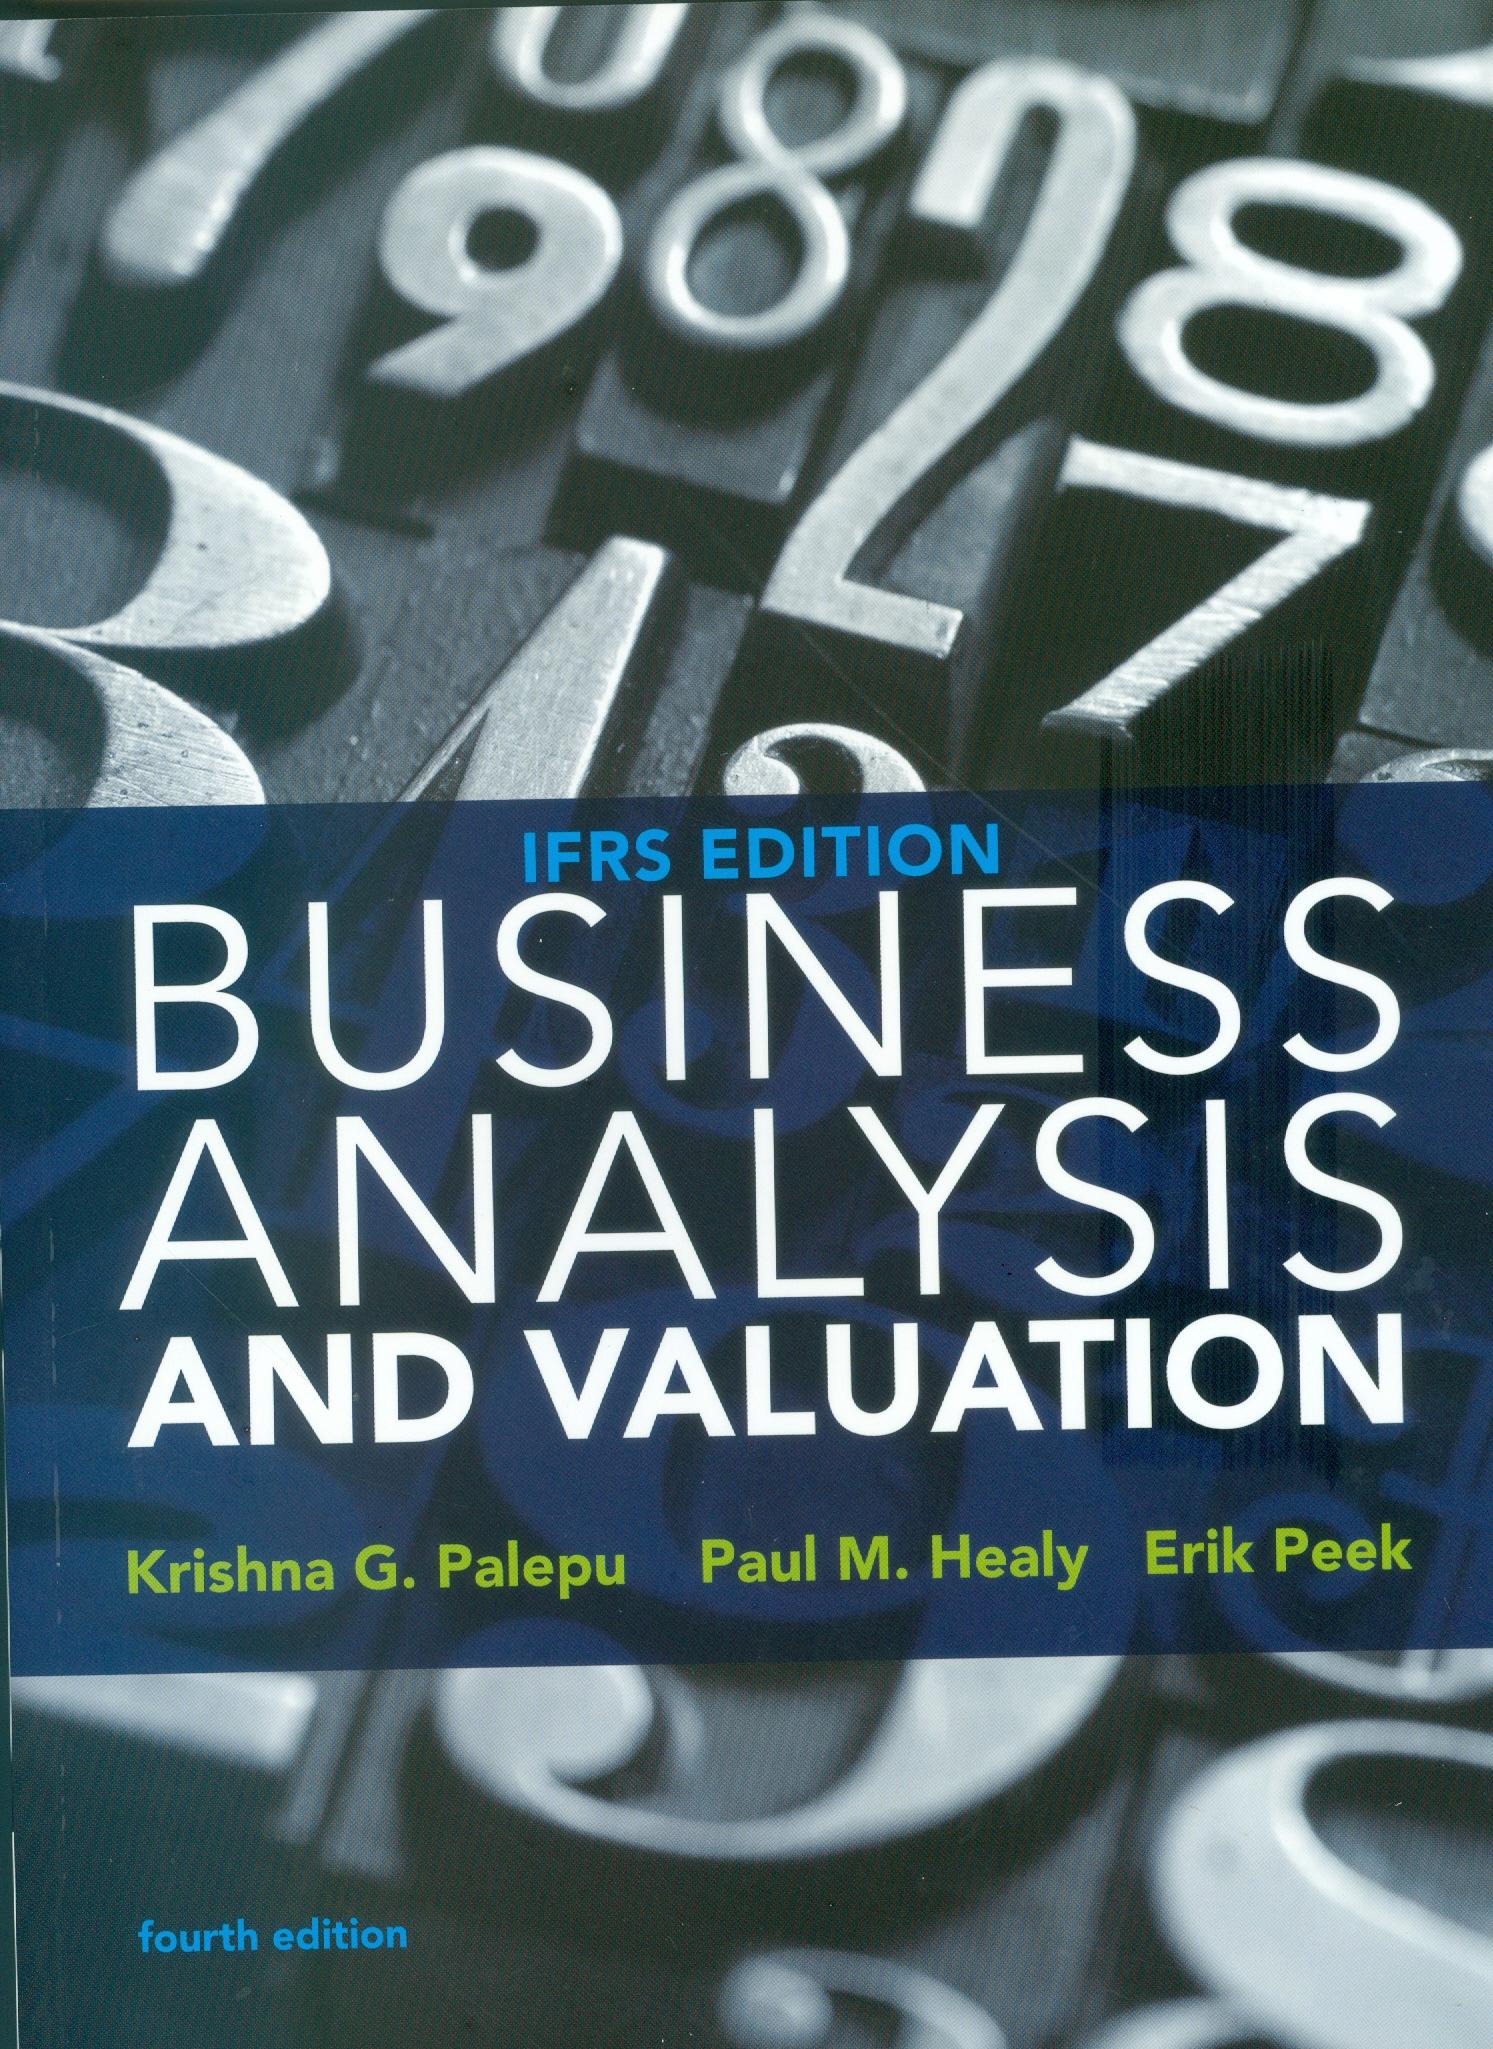 business analysis1.jpg